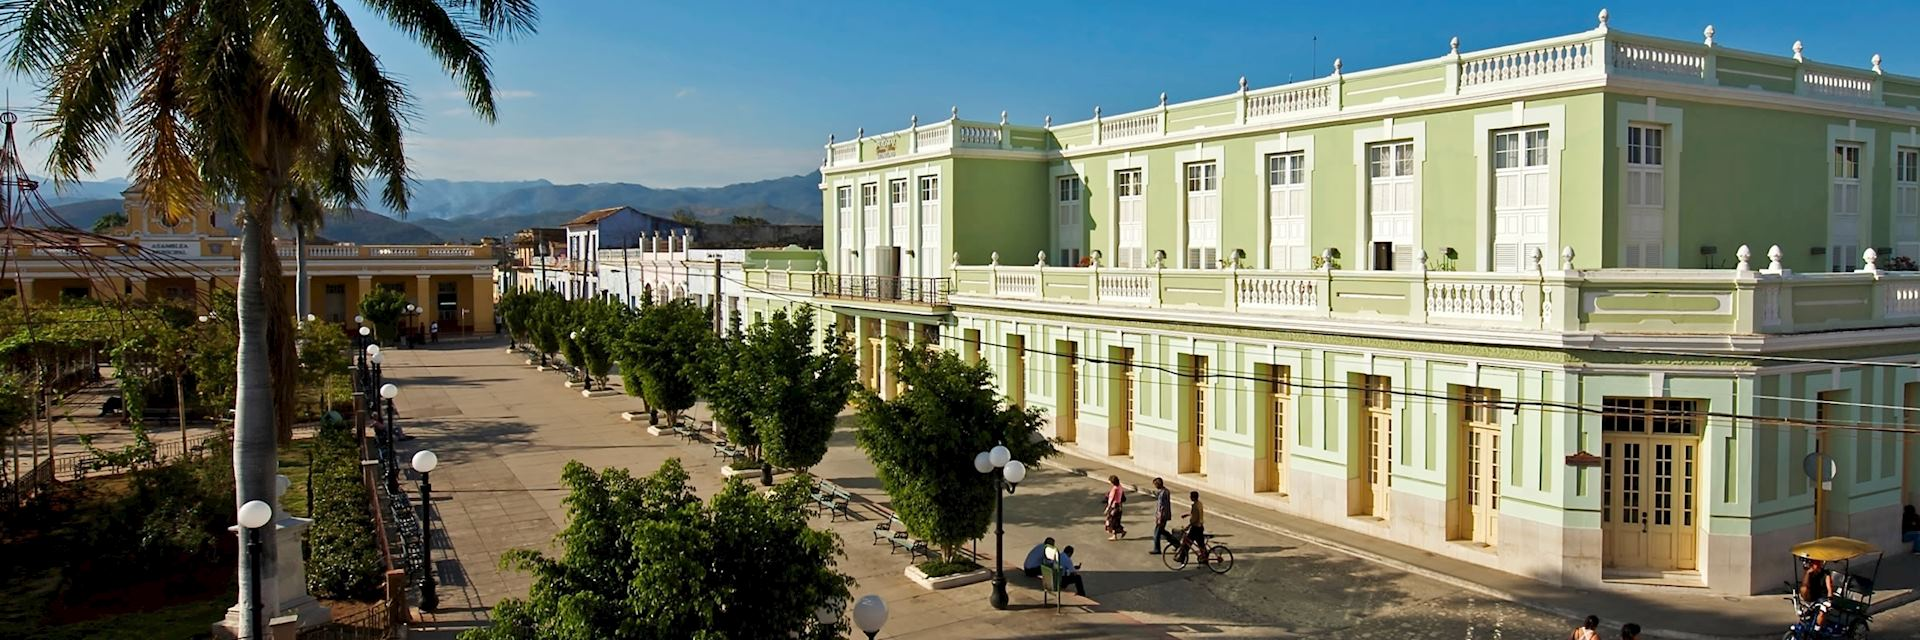 Iberostar Grand Hotel, Trinidad